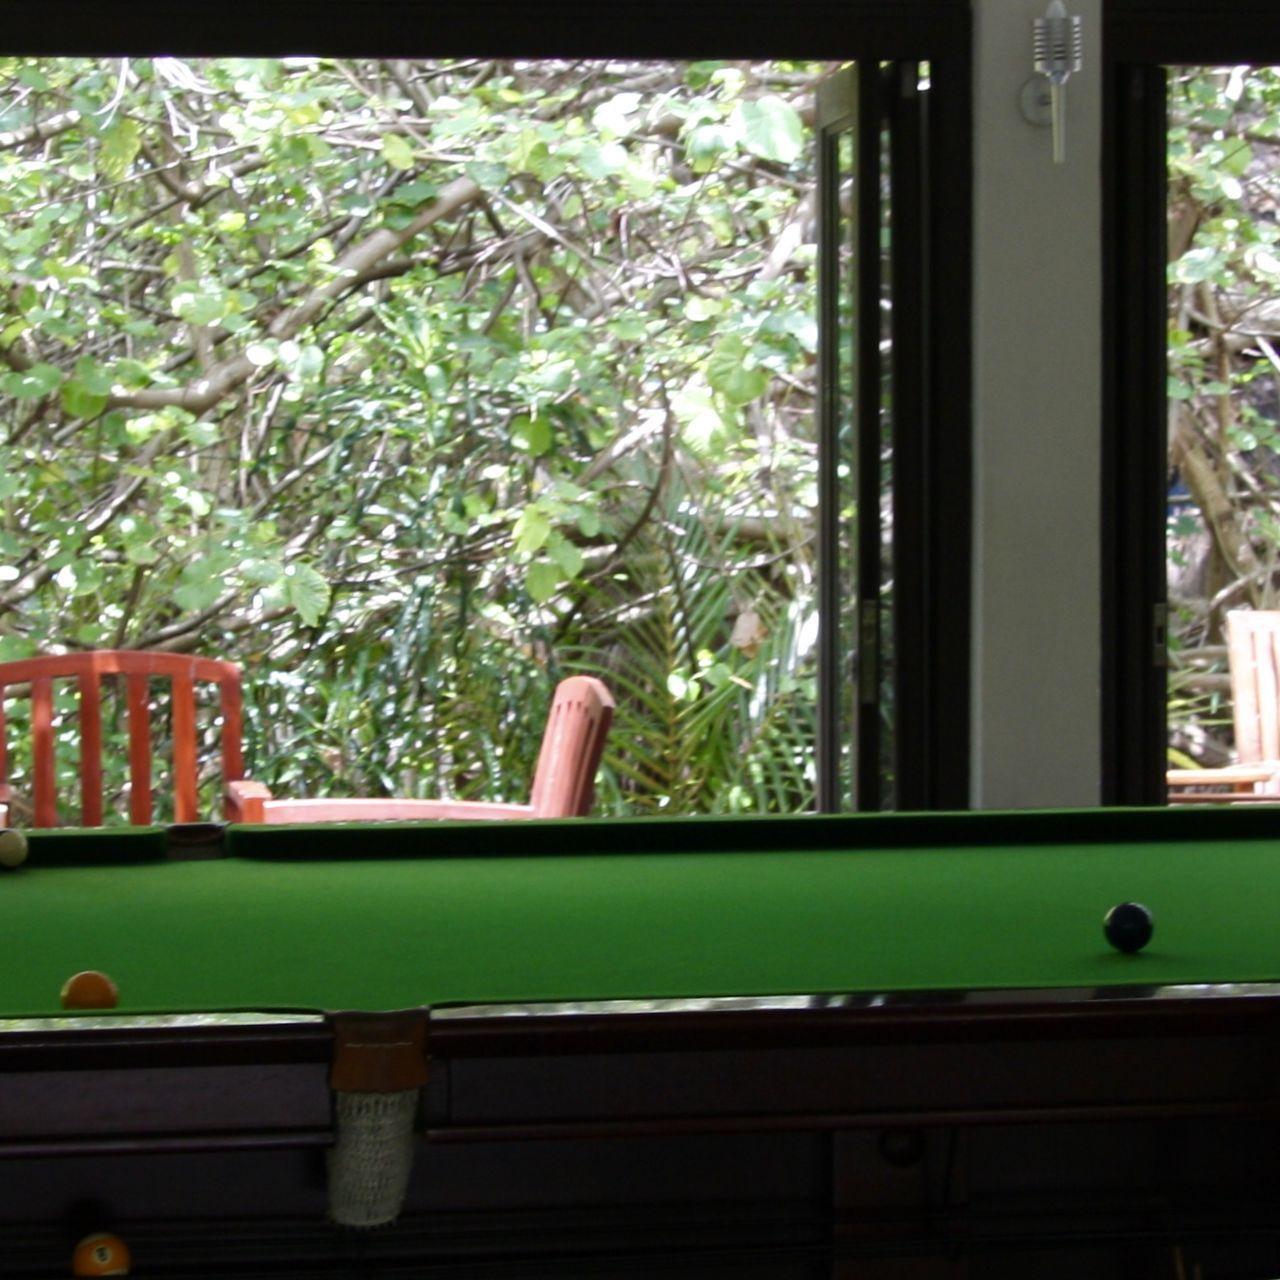 playing billiards Balcony Ball Billiards Colors Day Design Fun Garden Greenery Hobby Holiday Interior Light Light And Shadow Nature No People Pool Billard Snooker Summer Tree Tropical Window Wooden